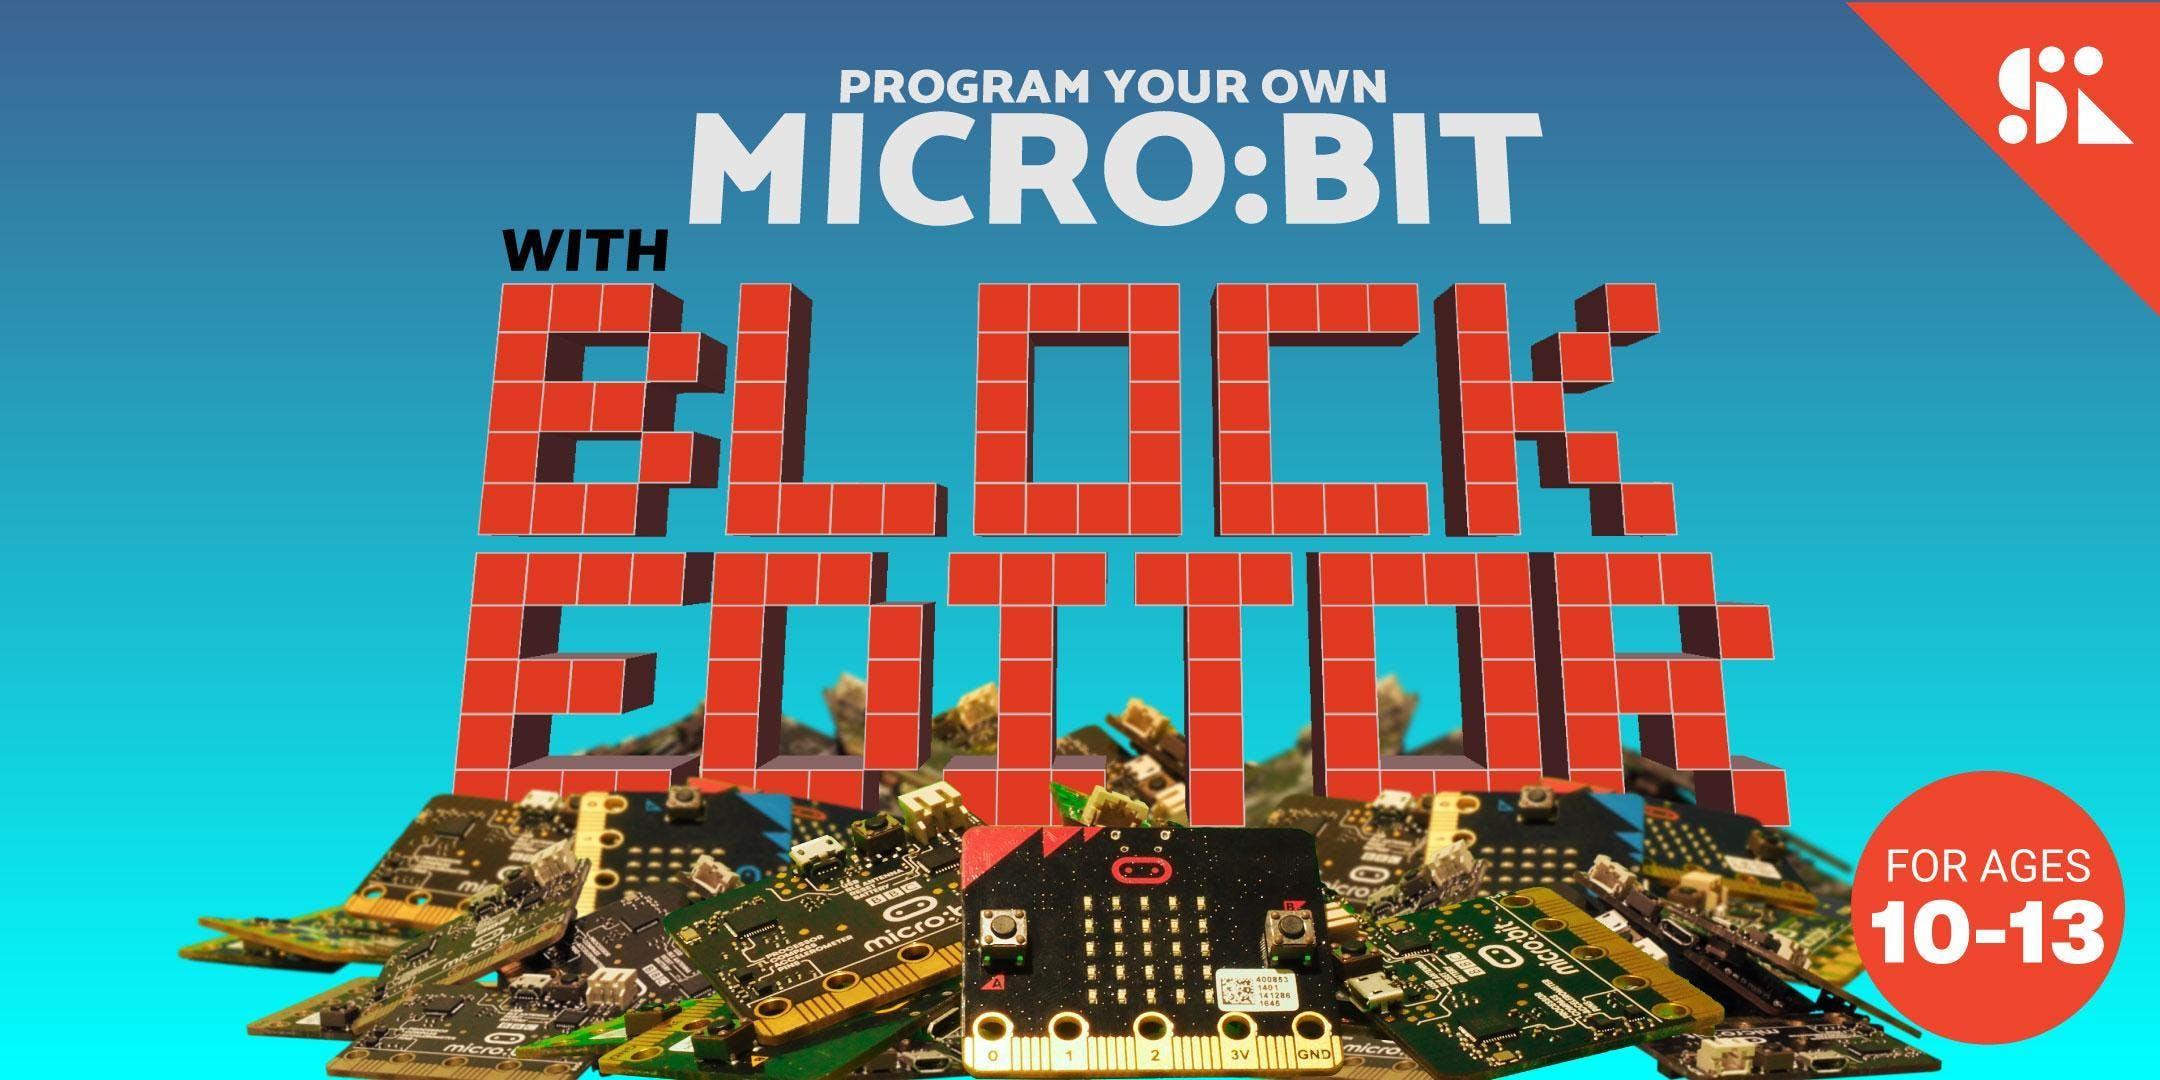 Code & Invent with Microbit Block Editor [Ages 10-13] 18 Jun - 22 Jun Holiday Camp (145PM)  Yishun